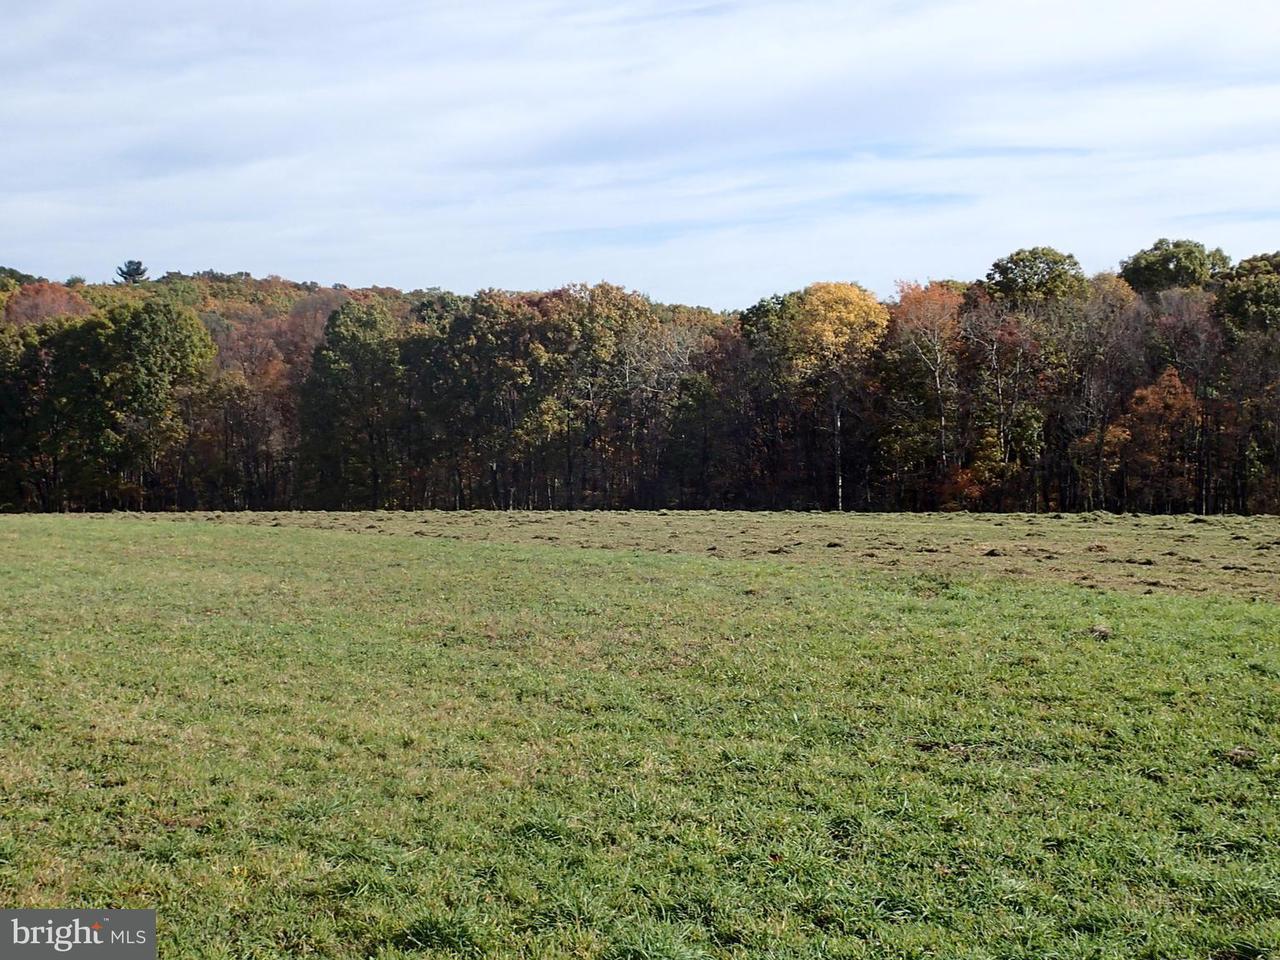 Land for Sale at Piney Ridge Road Not On File Huntingdon, Pennsylvania 16652 United States